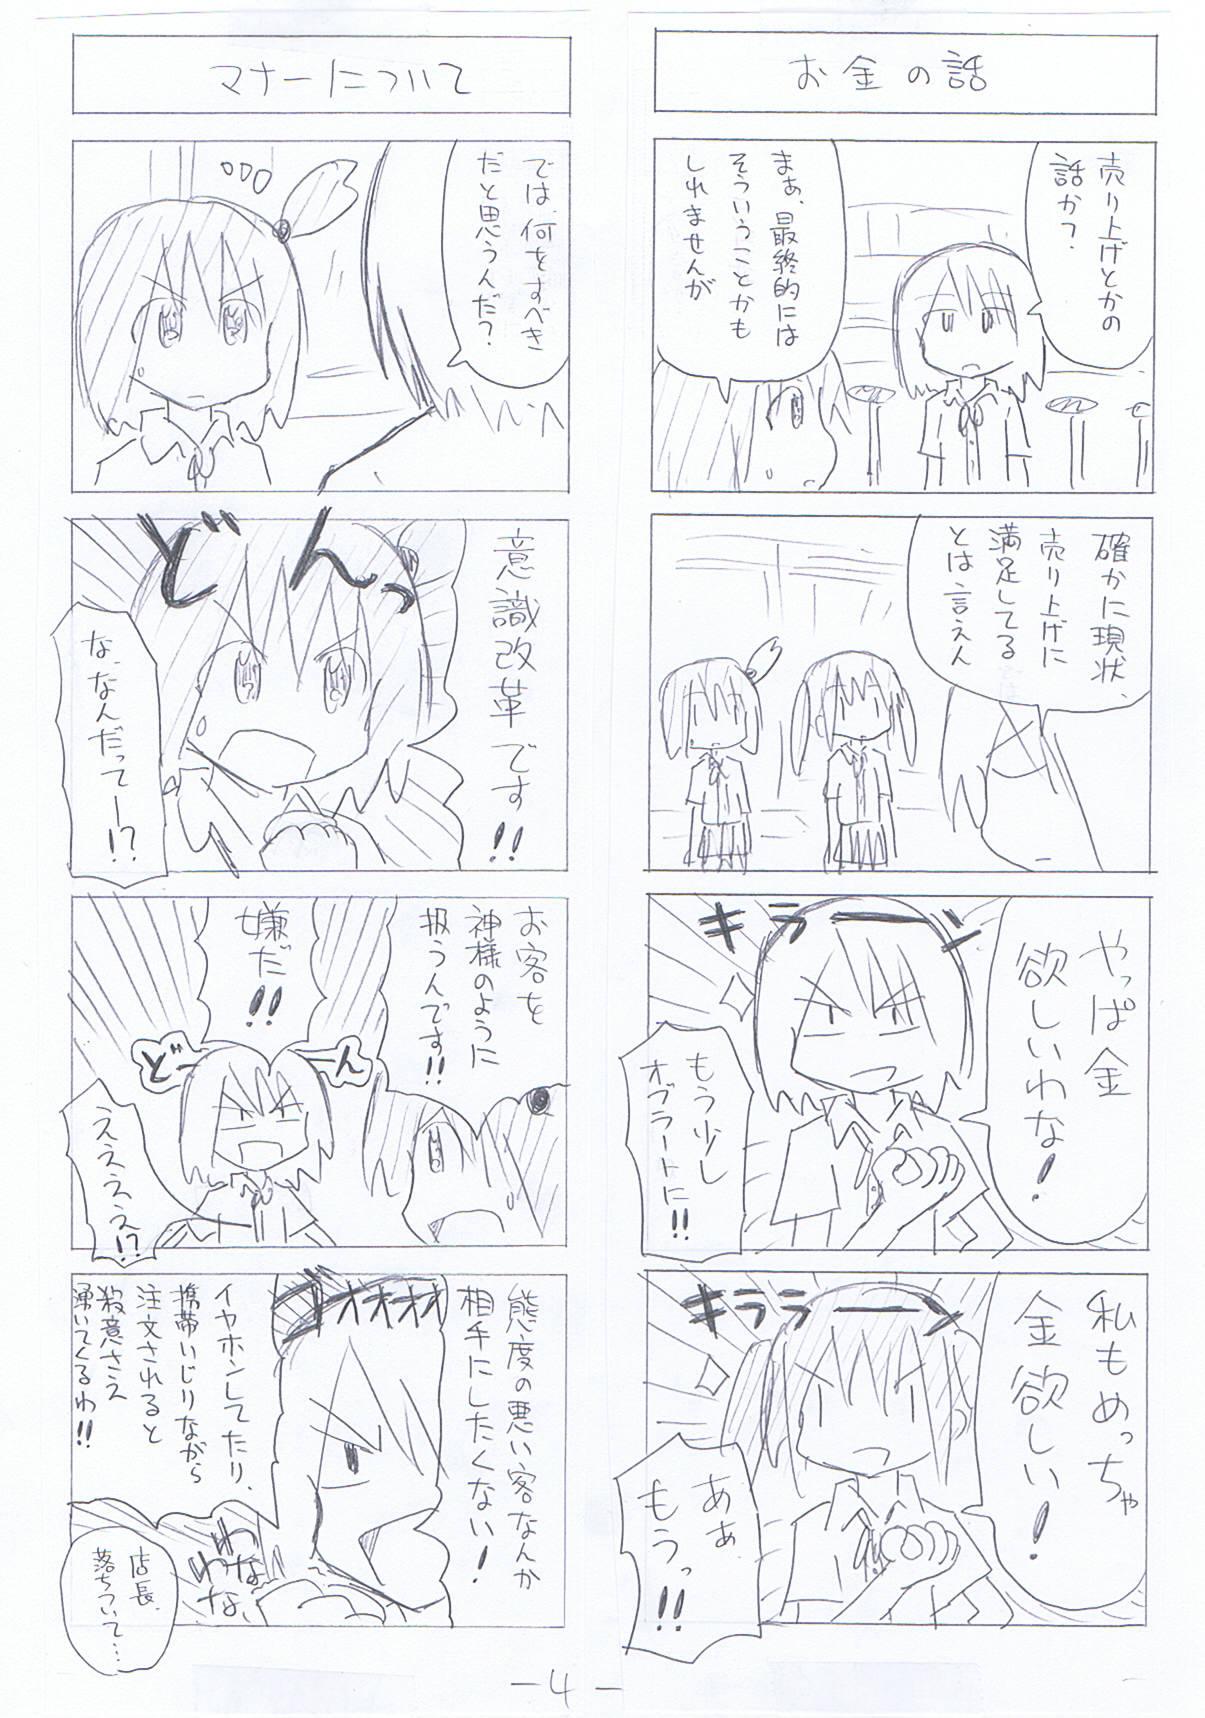 hitotoki-2-4.jpg